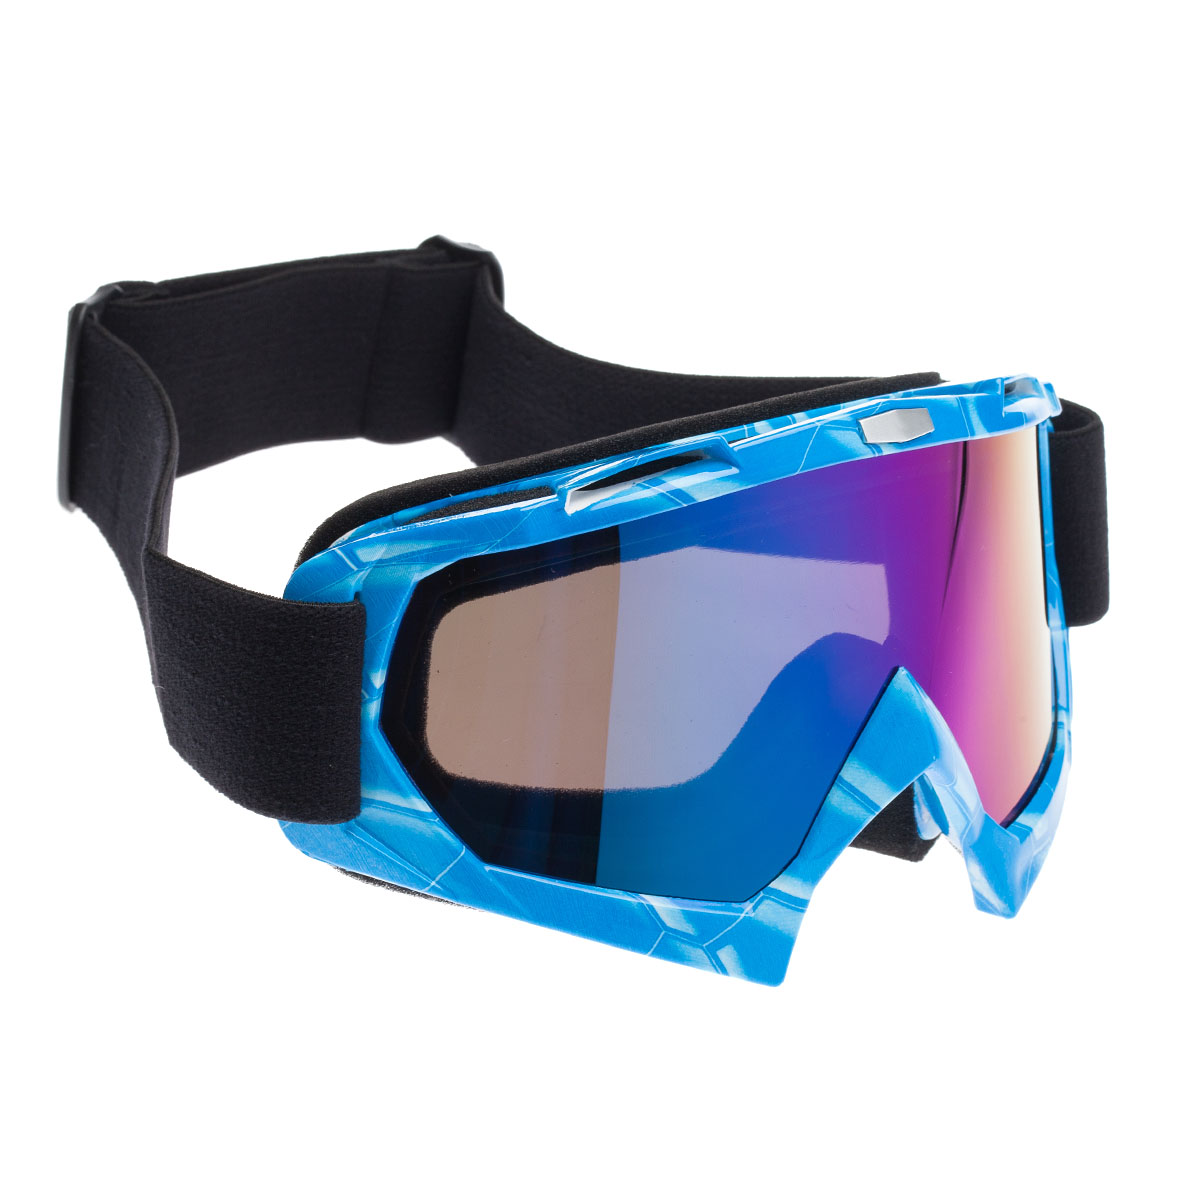 очки горнолыжные vcan ag0172 vse64 Горнолыжные очки Exparc, 15653-6